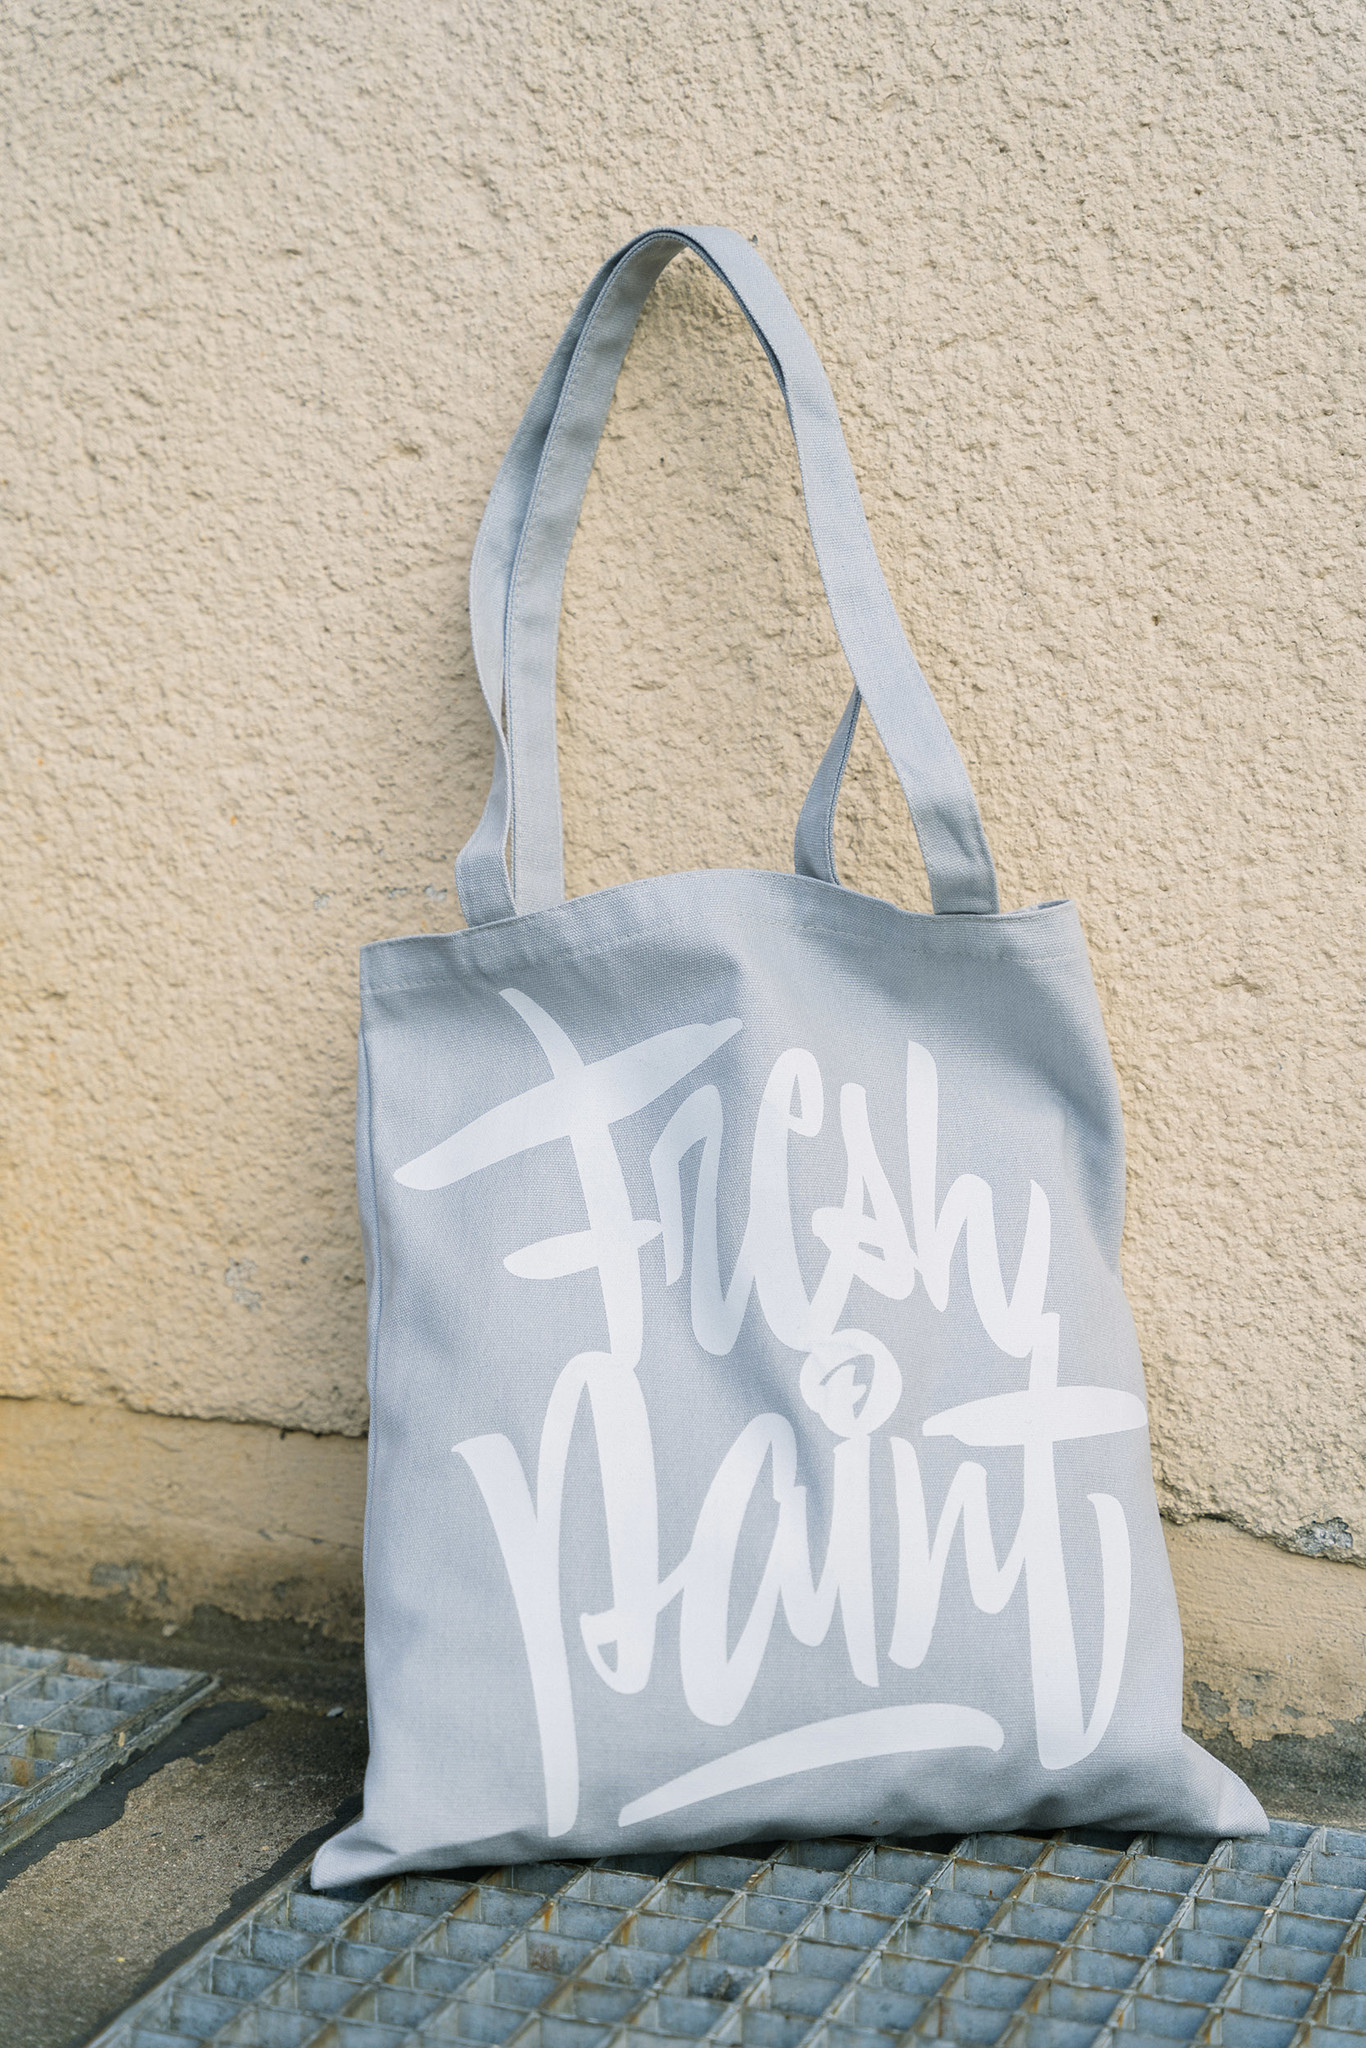 Montana Cotton Bag - FRESH PAINT by Sergey Shapiro